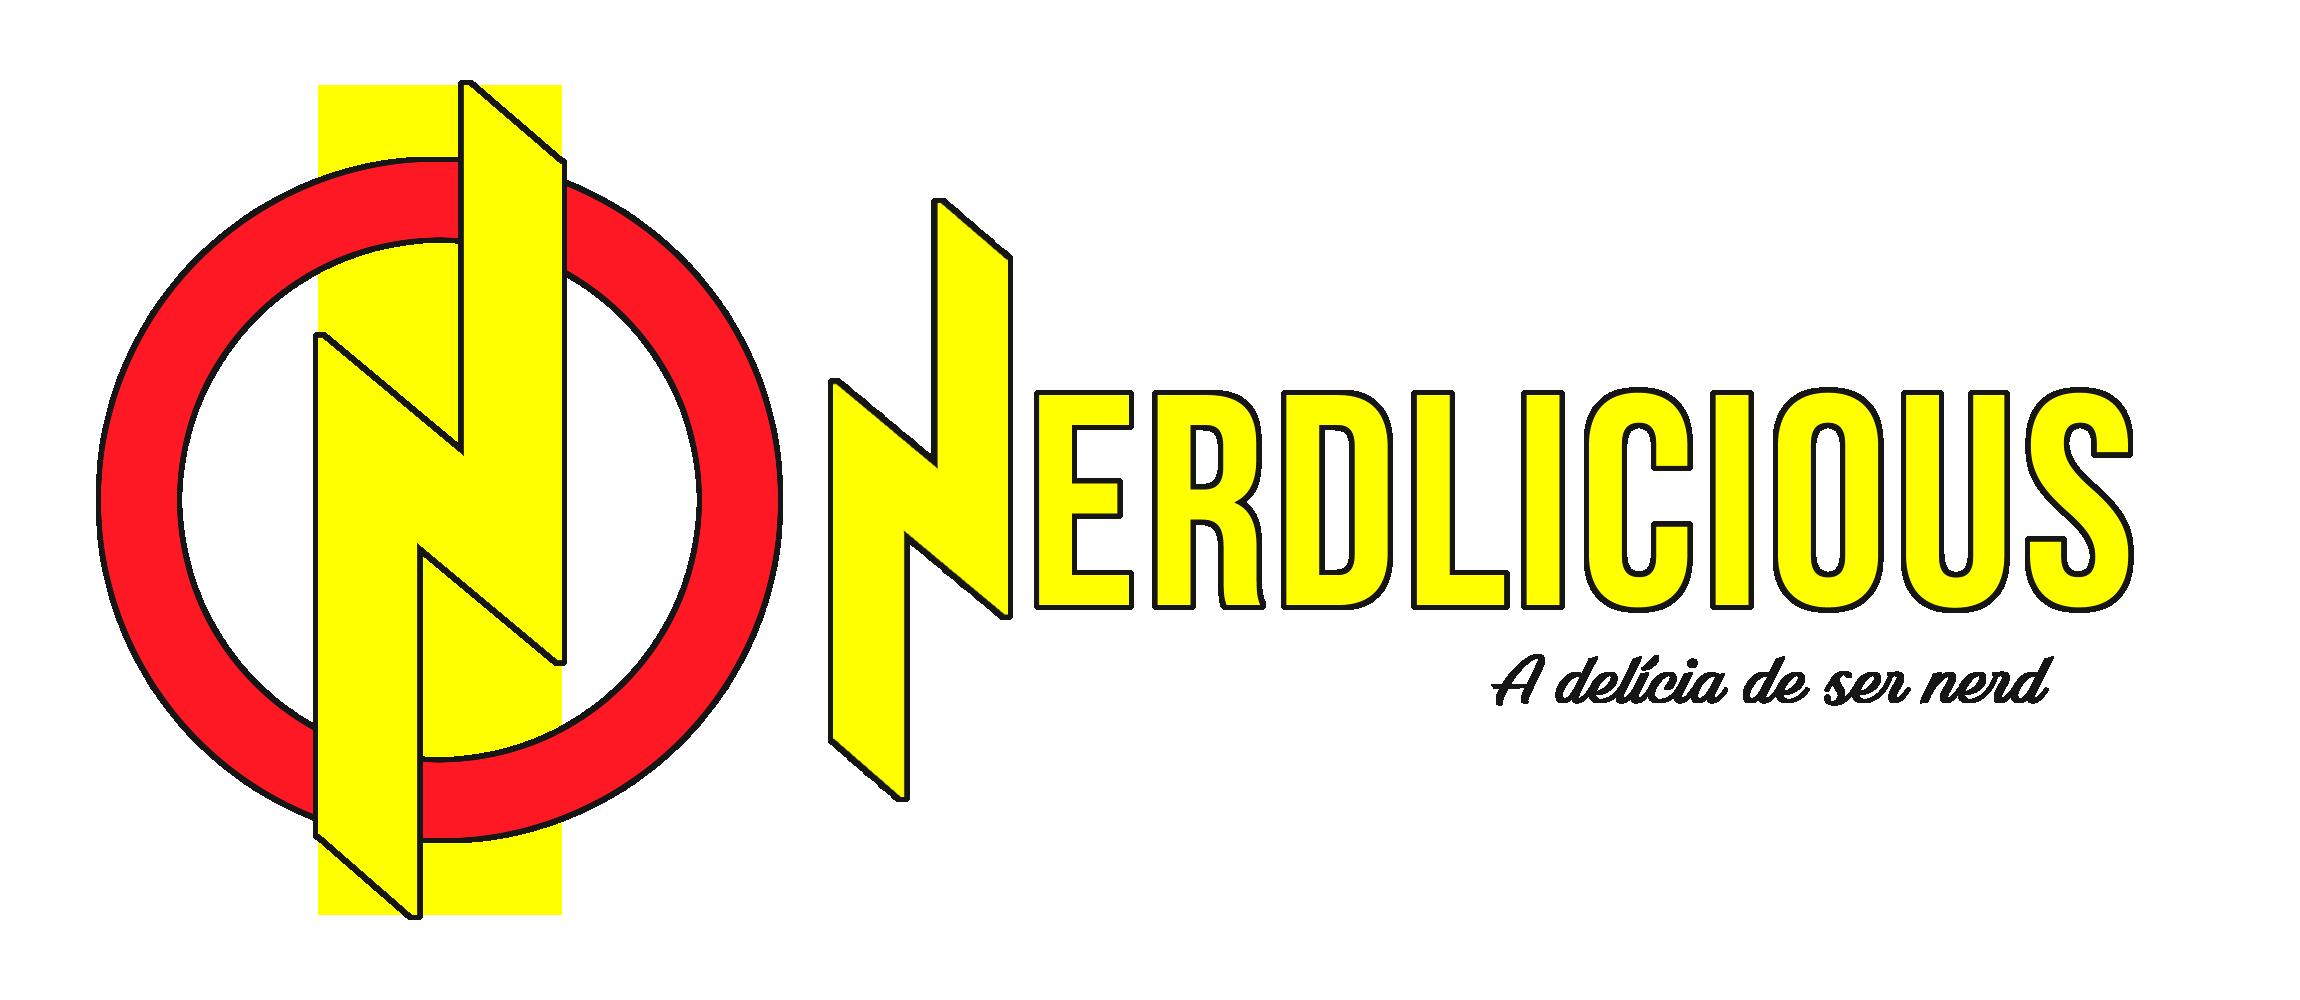 Nerdlicious - A delícia de ser NERD!